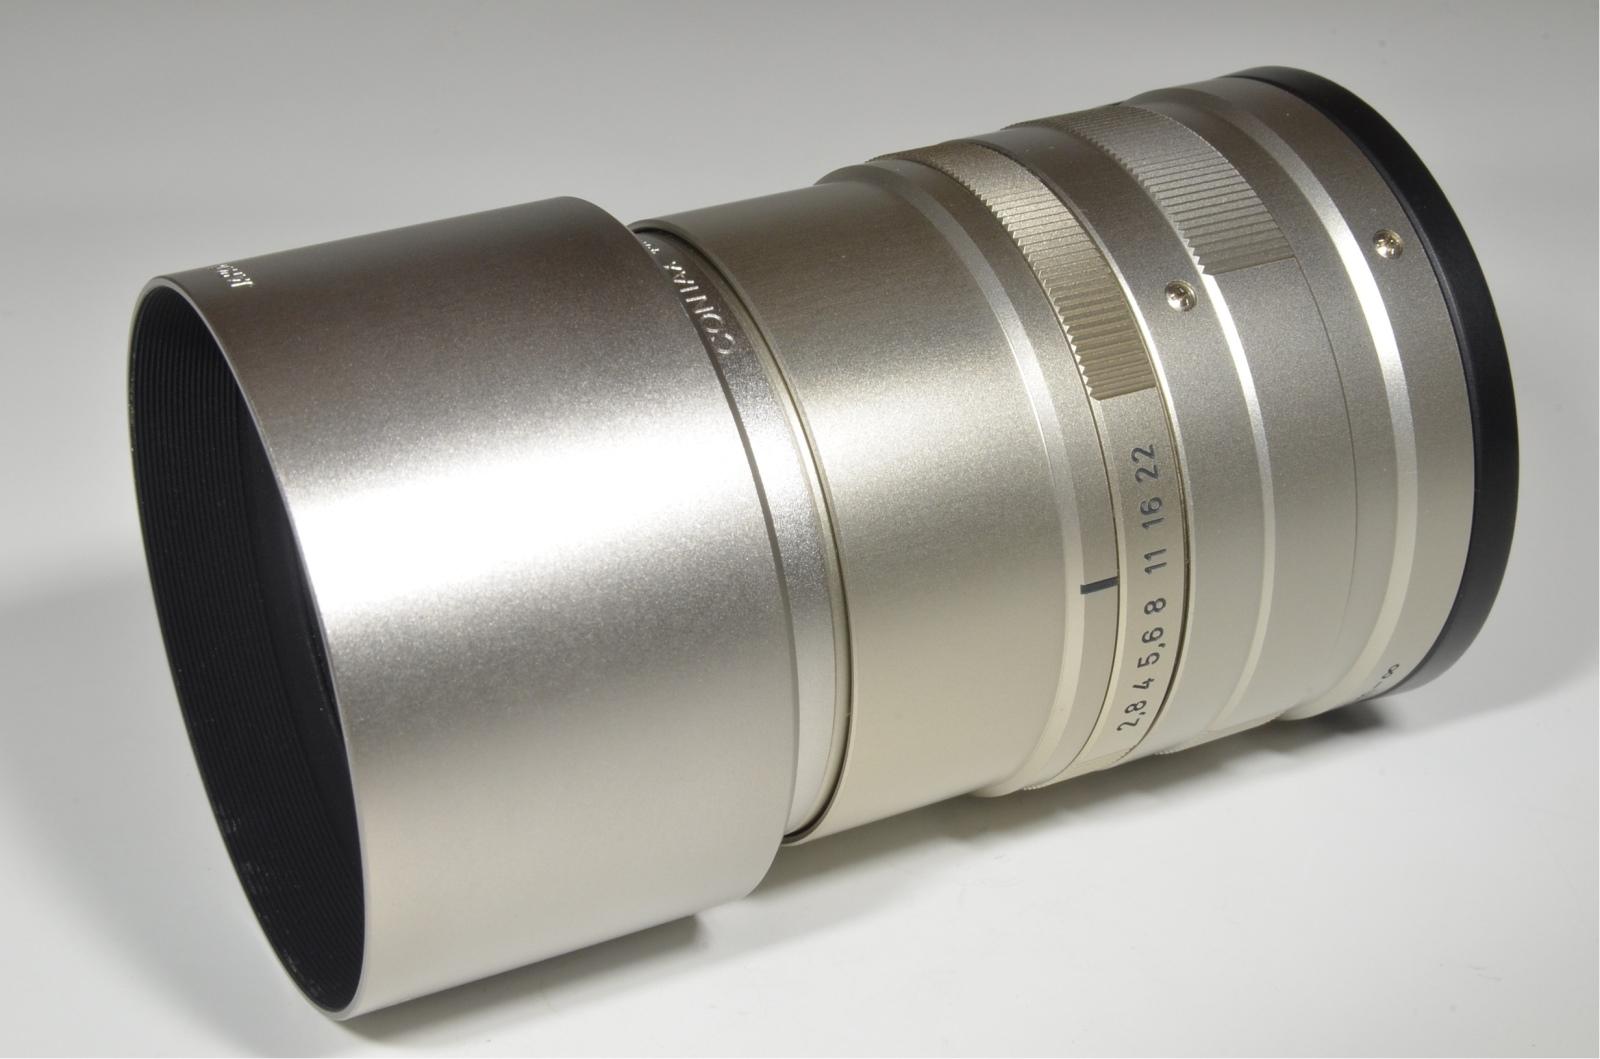 contax carl zeiss t* sonnar 90mm f2.8 g lens